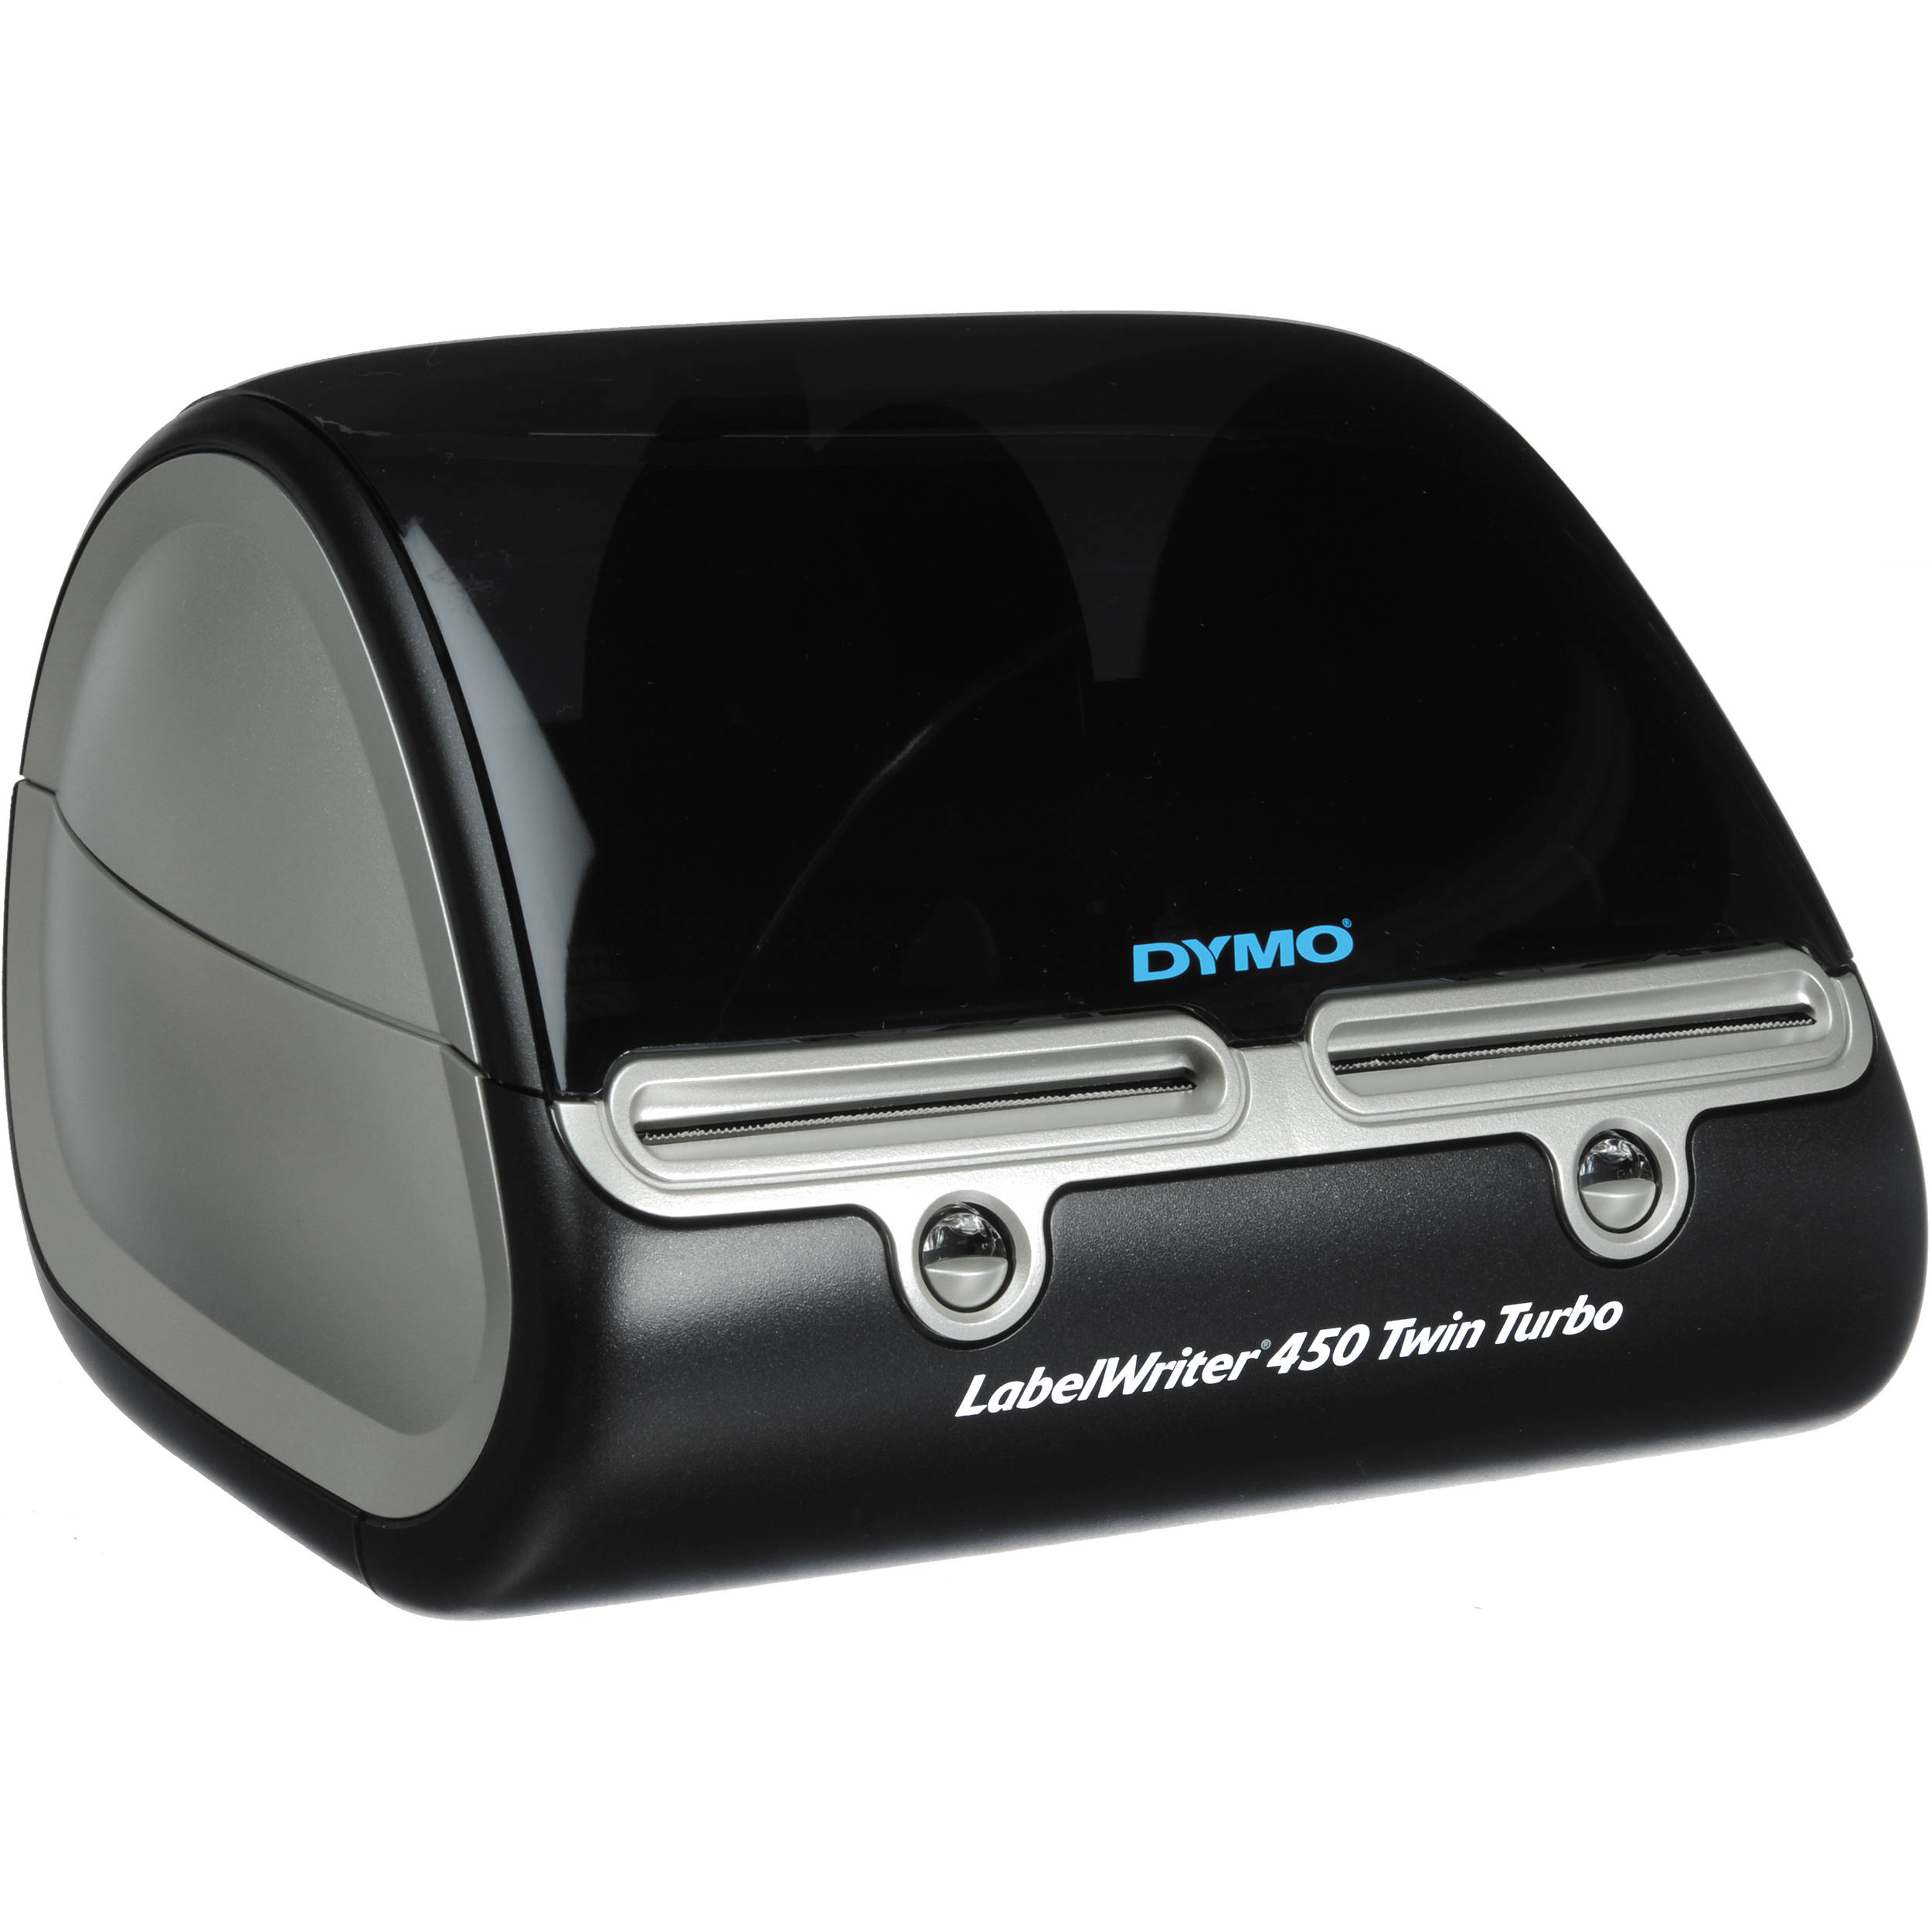 DYMO LABELWRITER TWIN TURBO WINDOWS XP DRIVER DOWNLOAD